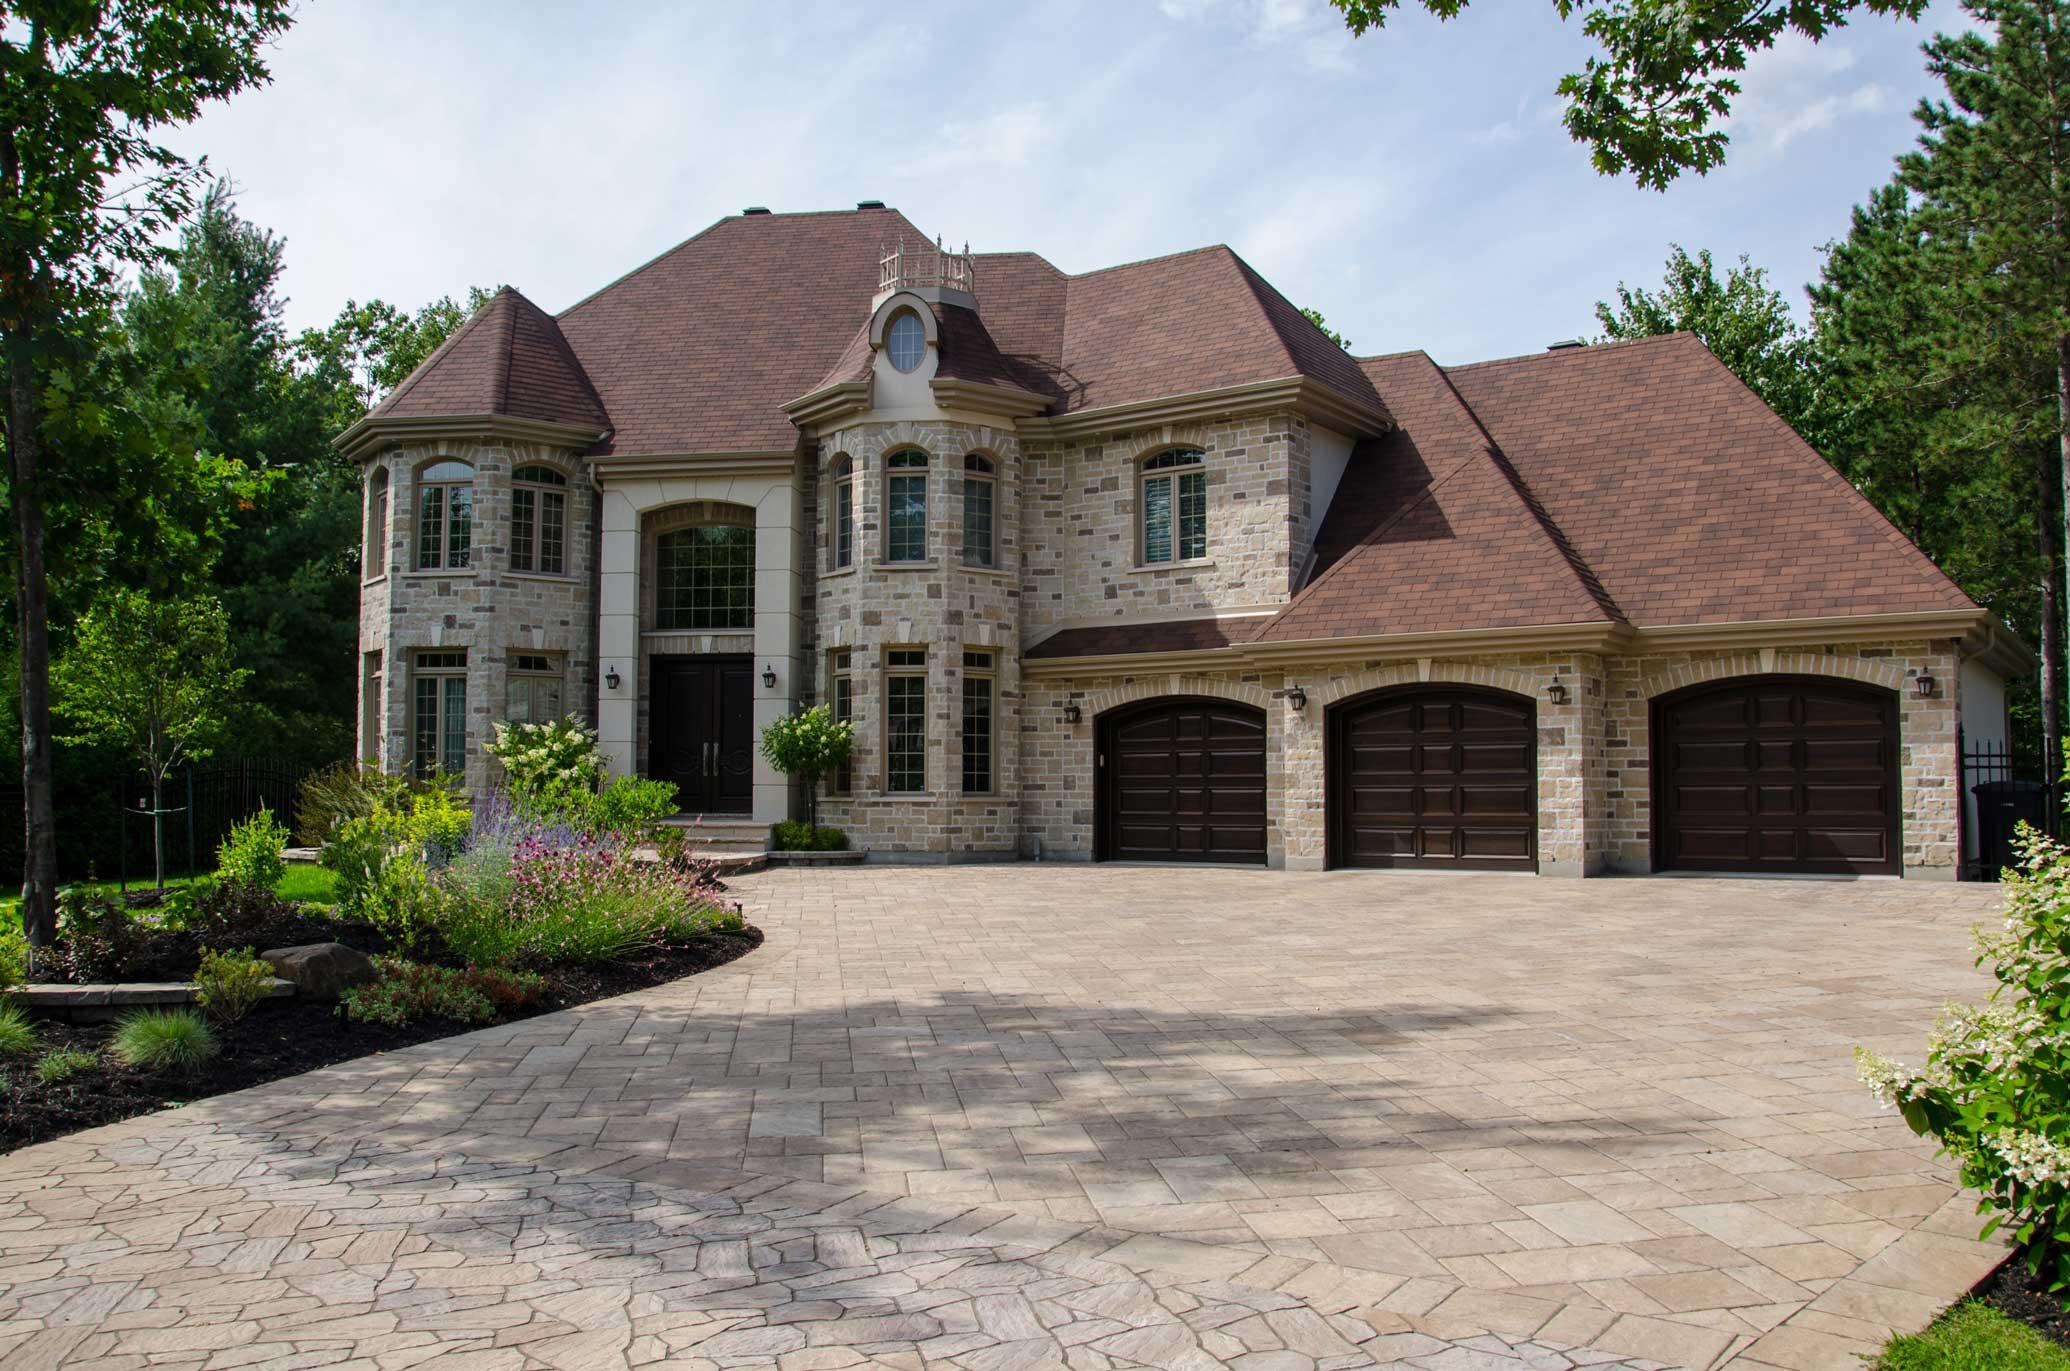 Calgary Real Estate Buy Sell Own House Condo